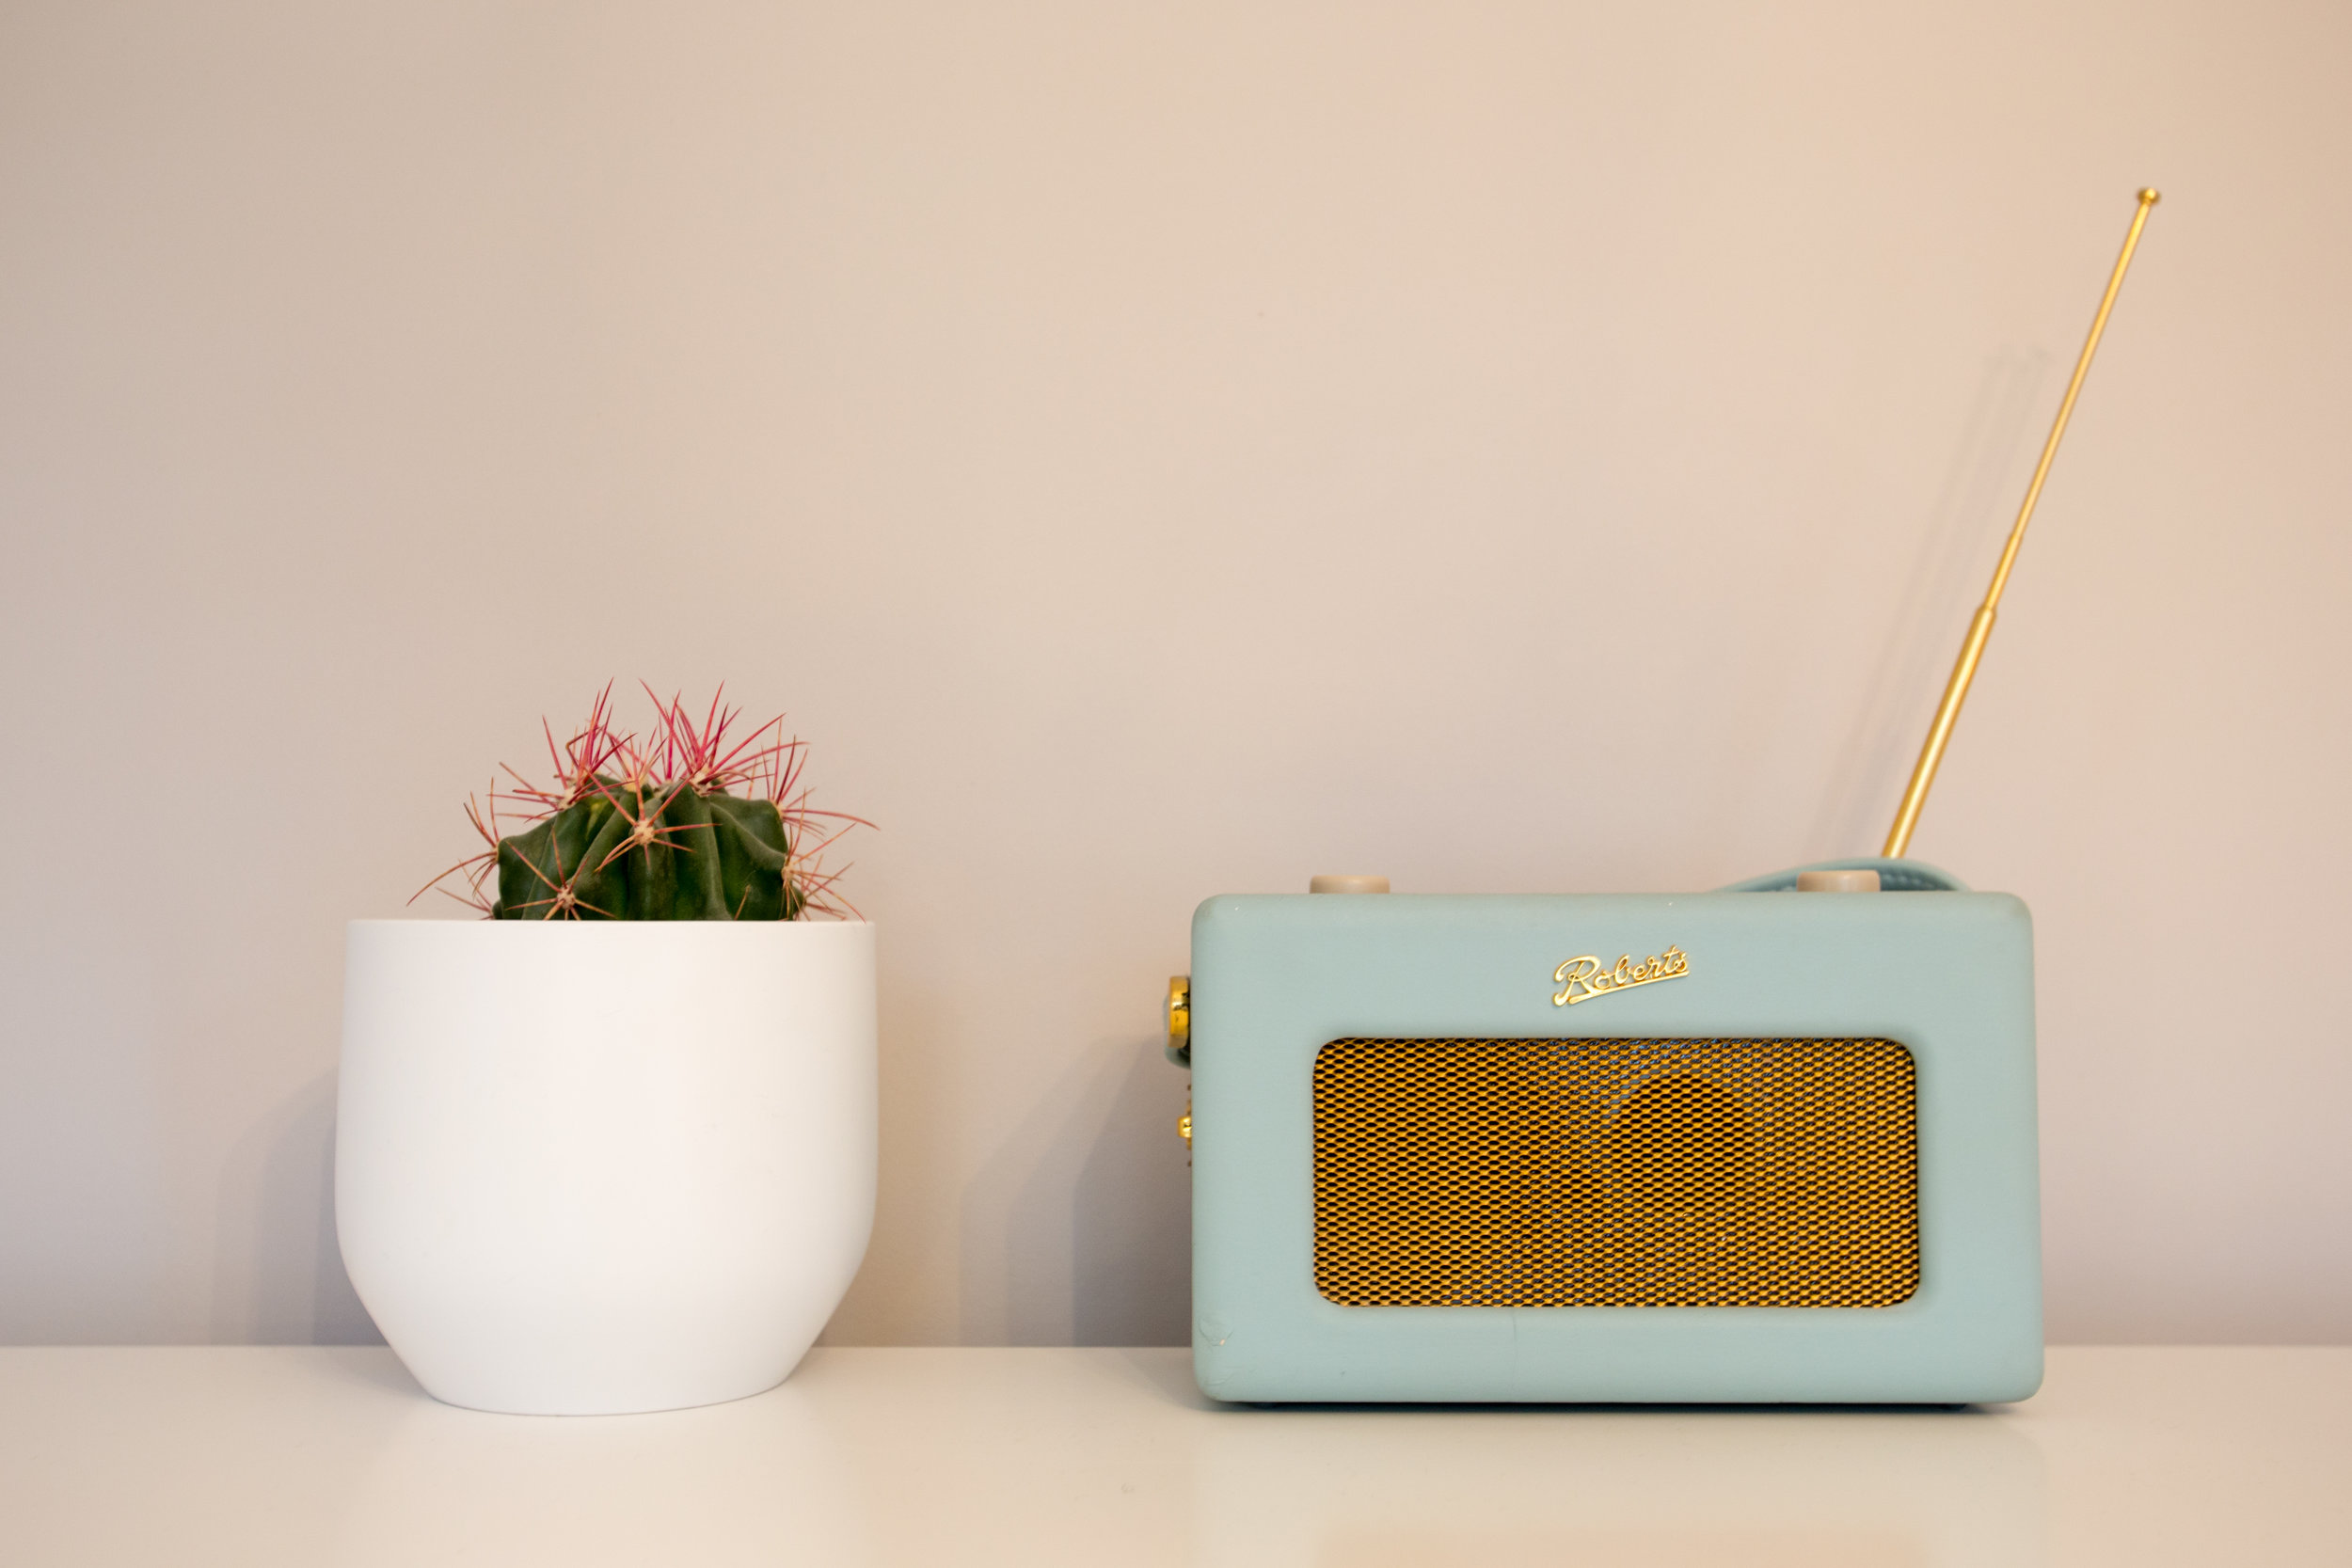 Bedroom details. Roberts Radio and cactus